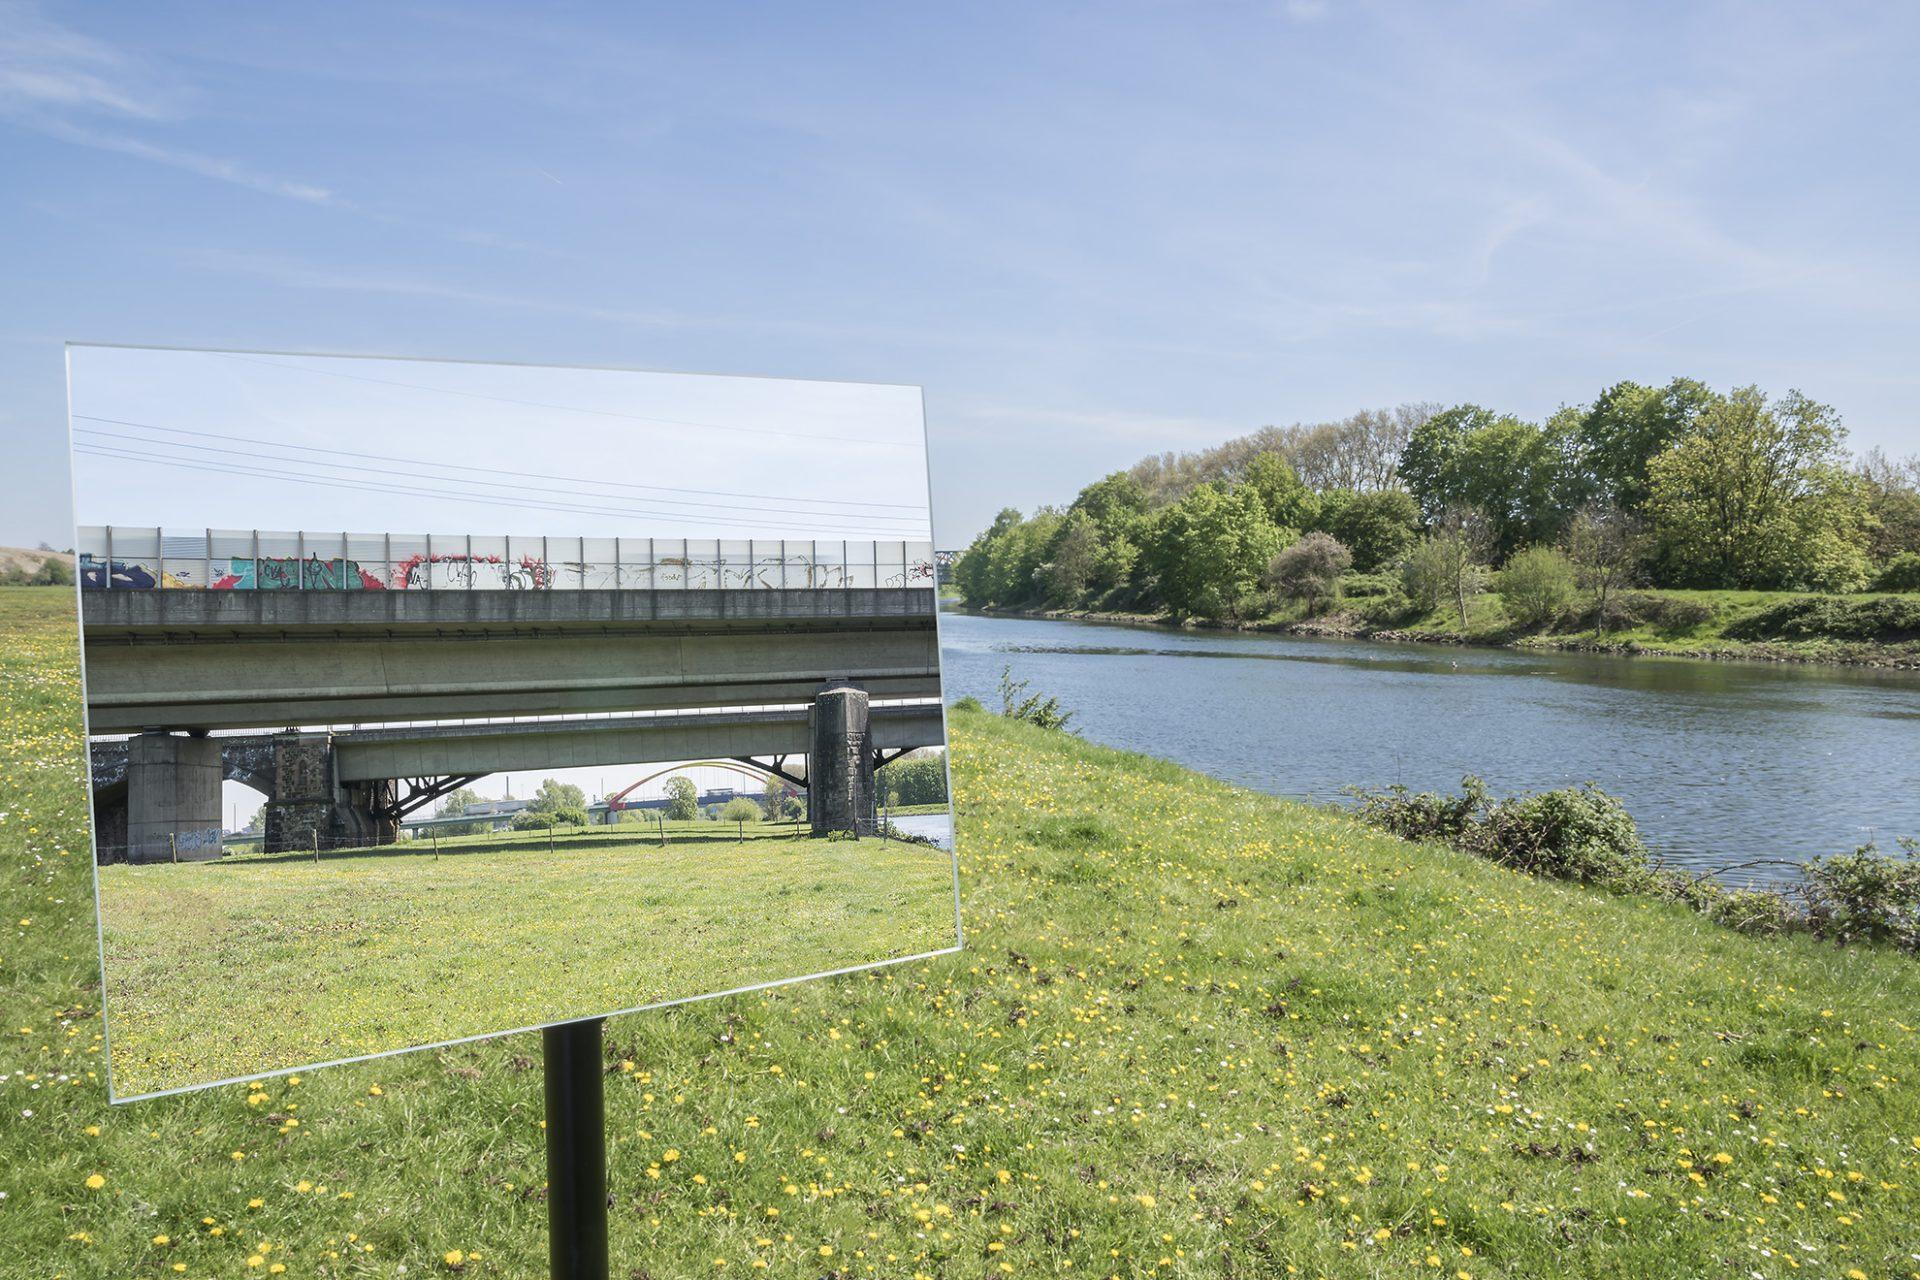 Brücke A 3/Ruhrwiese • Lambda-Print auf FUJIFILM Crystal Archive DPII, 75 x 50 cm, rahmenloser Bilderhalter • Auflage: 5 + 2 Artist's Proof